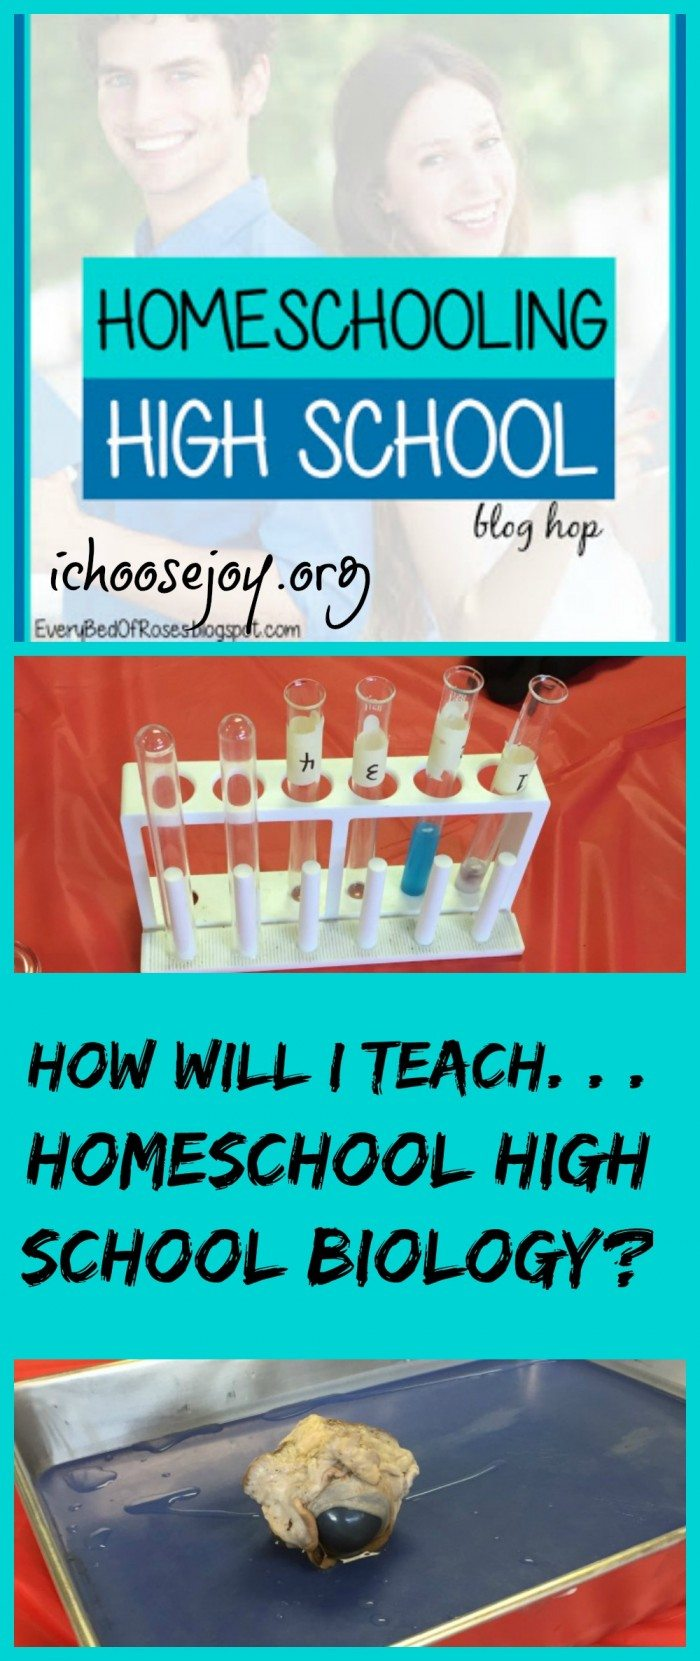 How Will I Teach Homeschool High School Biology